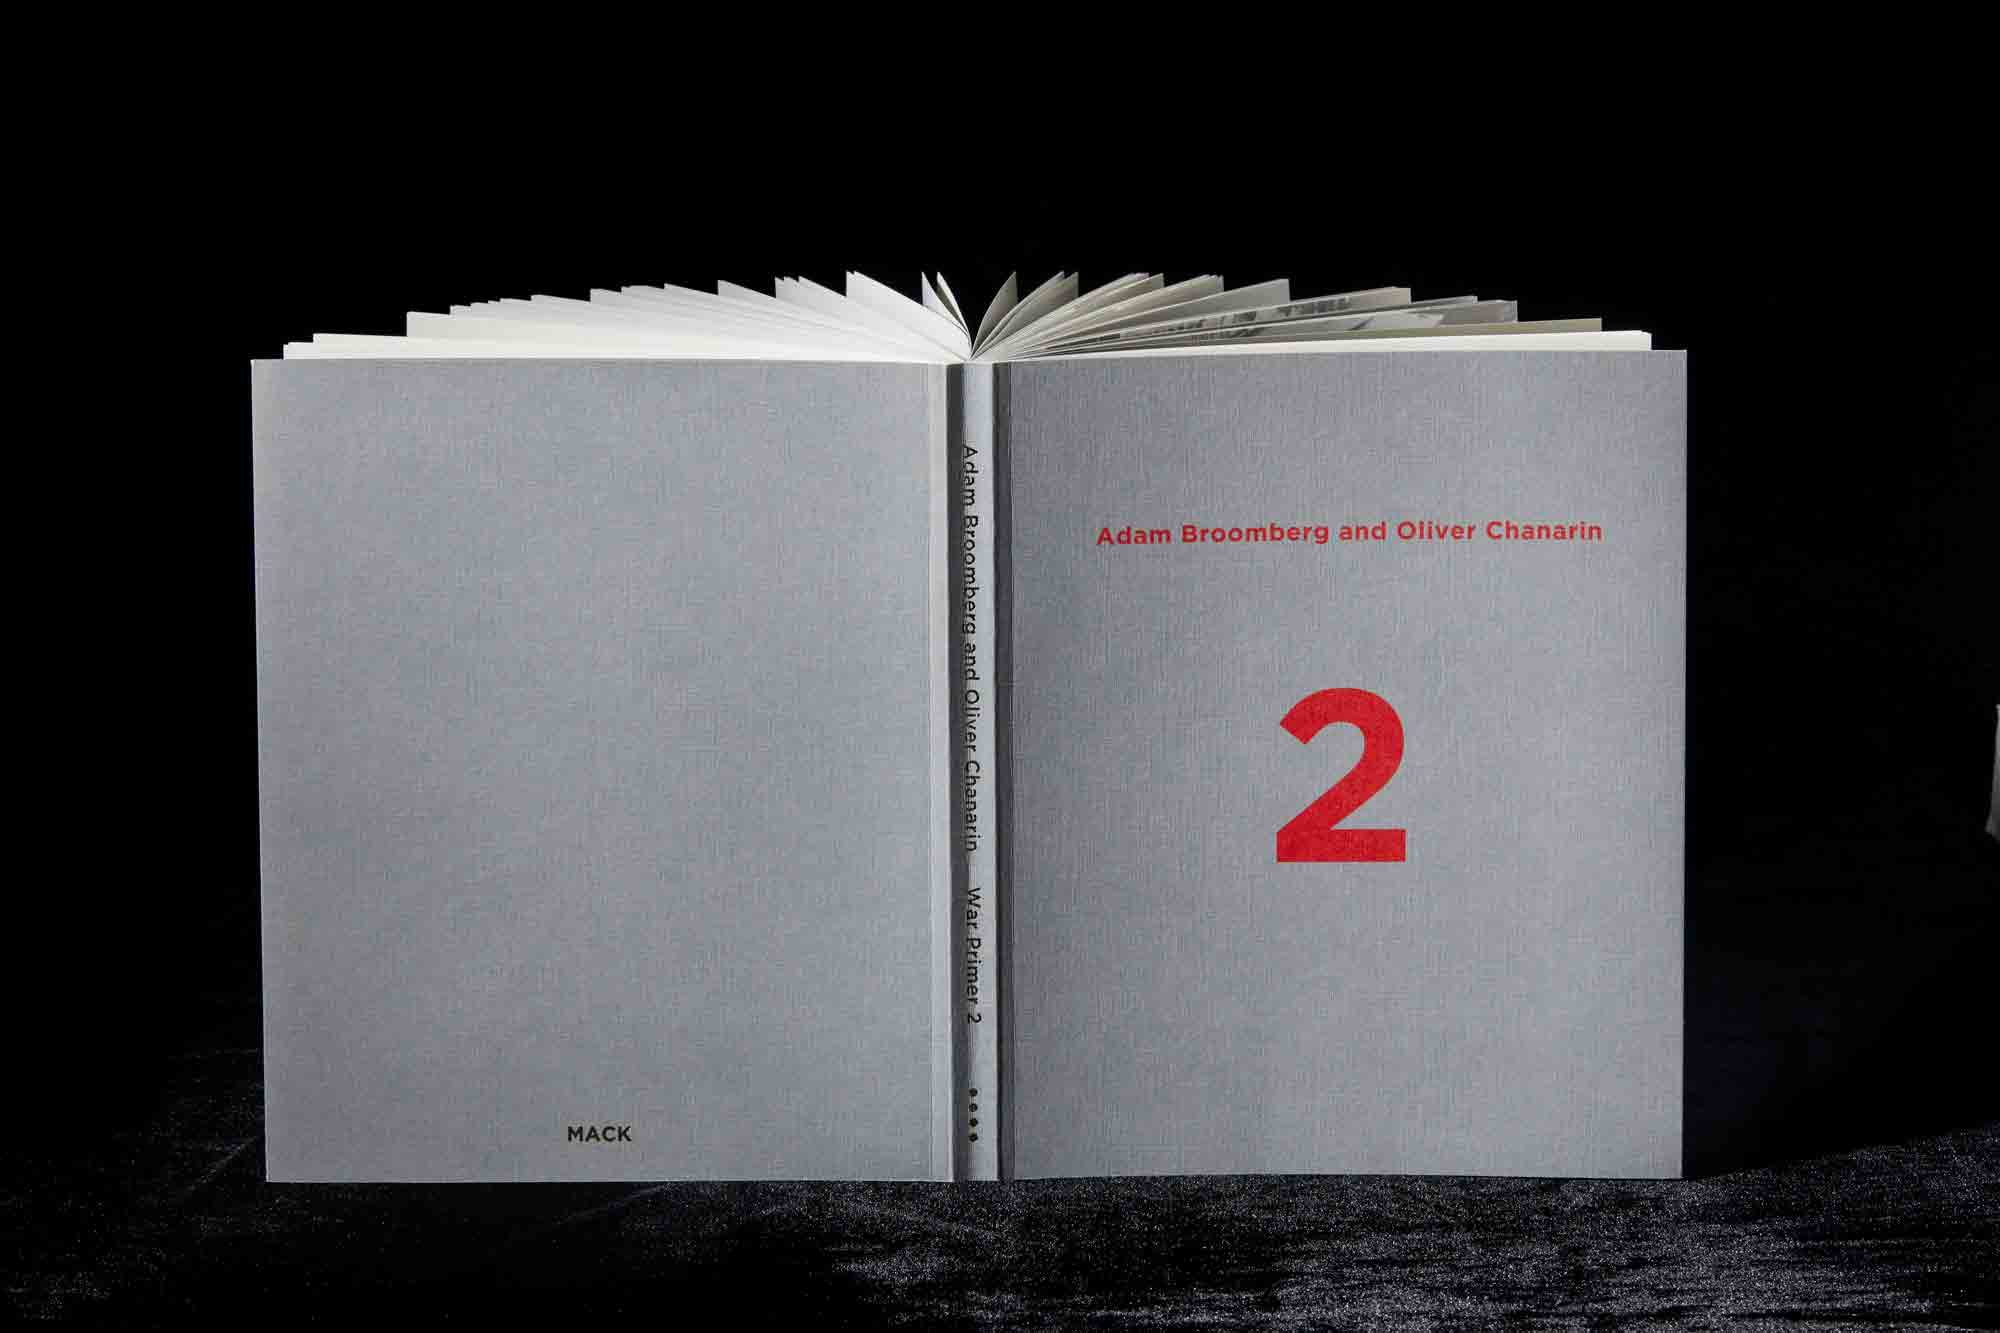 WINNER of the PHOTO-TEXT BOOK AWARD   Adam BROOMBERG & Oliver CHANARIN,  War Primer 2,  MACK, London (England)